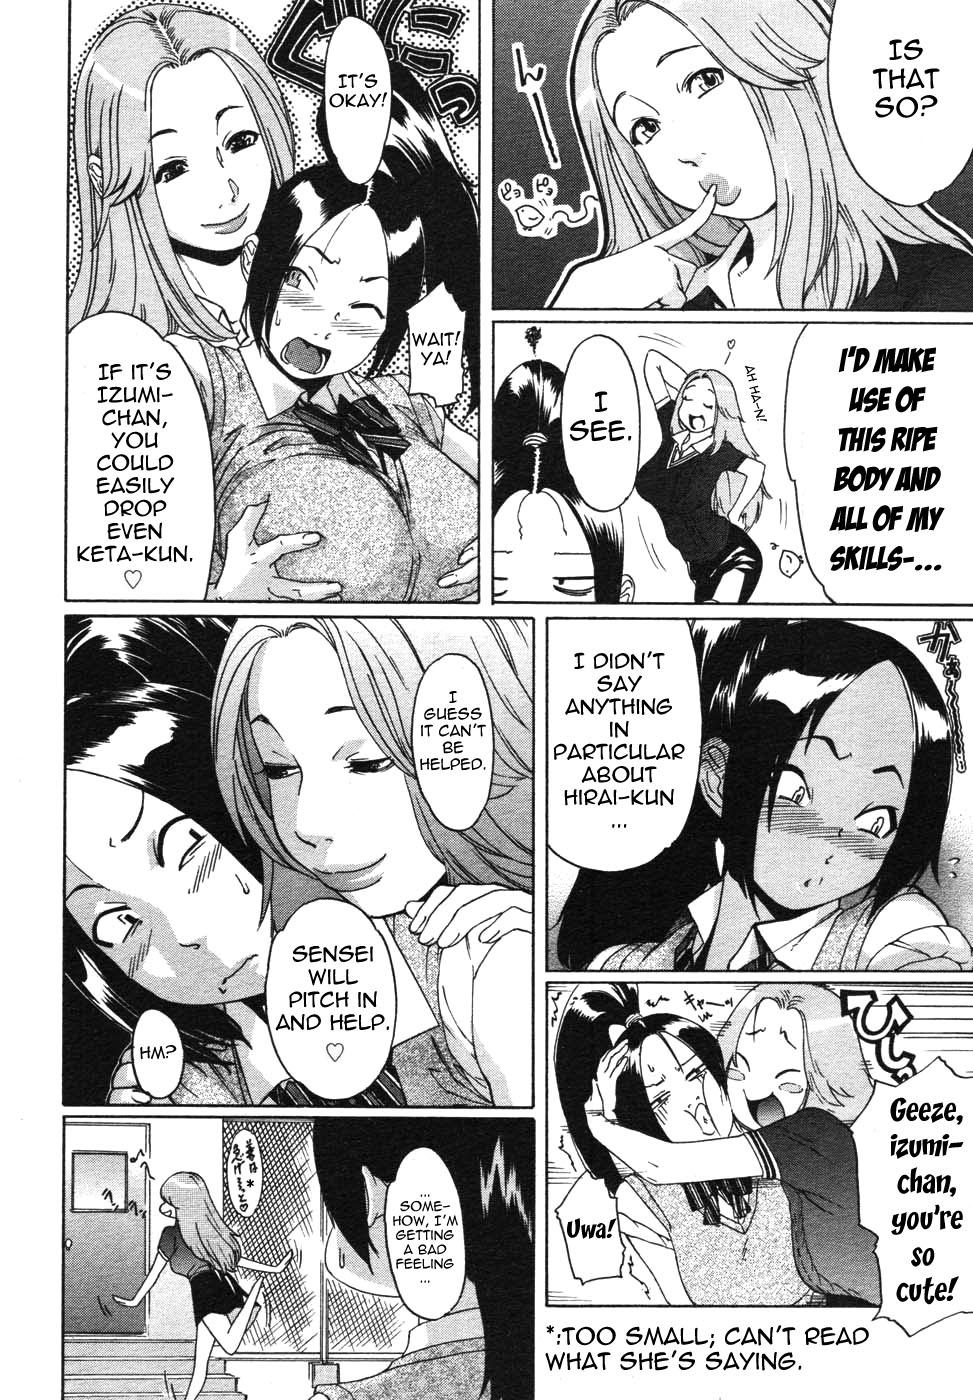 [Royal Koyanagi] Milky Shot! (School Is Crazy these Days) Ch.1-2 [English] 29